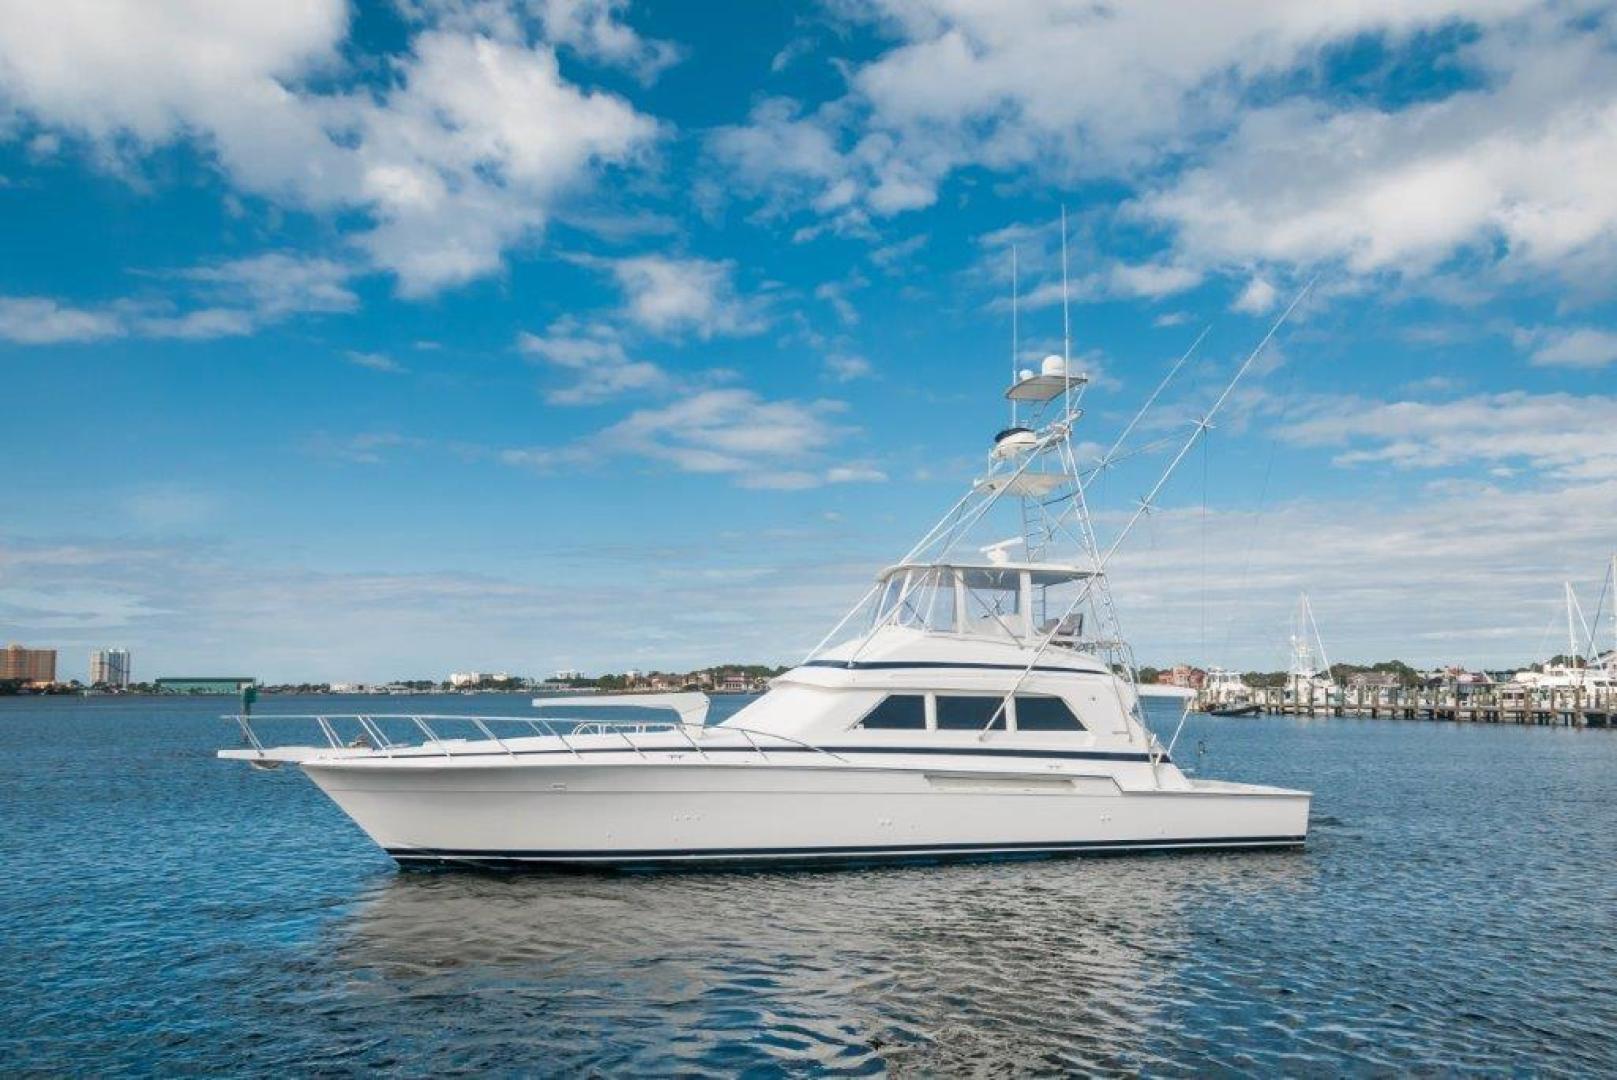 Bertram-60 Convertible 1998-Lady Rosa Pensacola-Florida-United States-1998 60 Bertram Convertible Lady Rosa Port Profile (2)-720382   Thumbnail